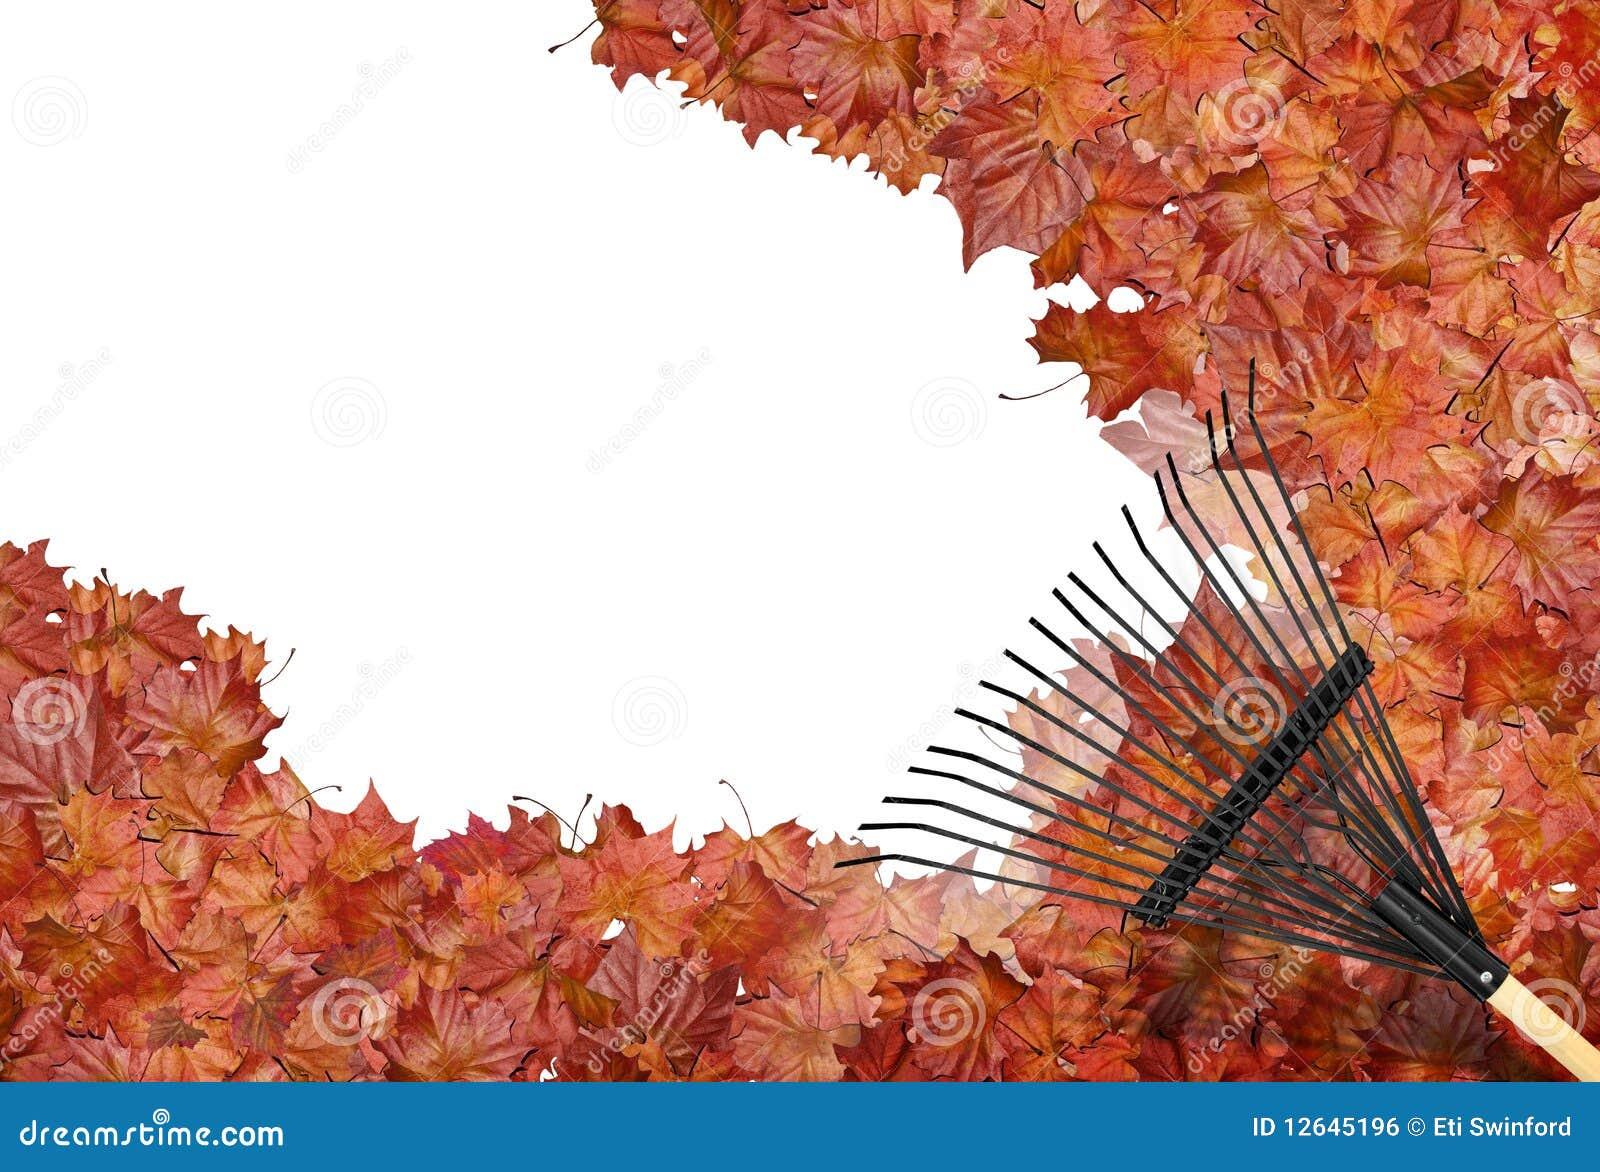 Raking Leaves Stock Photo Image Of Environmental